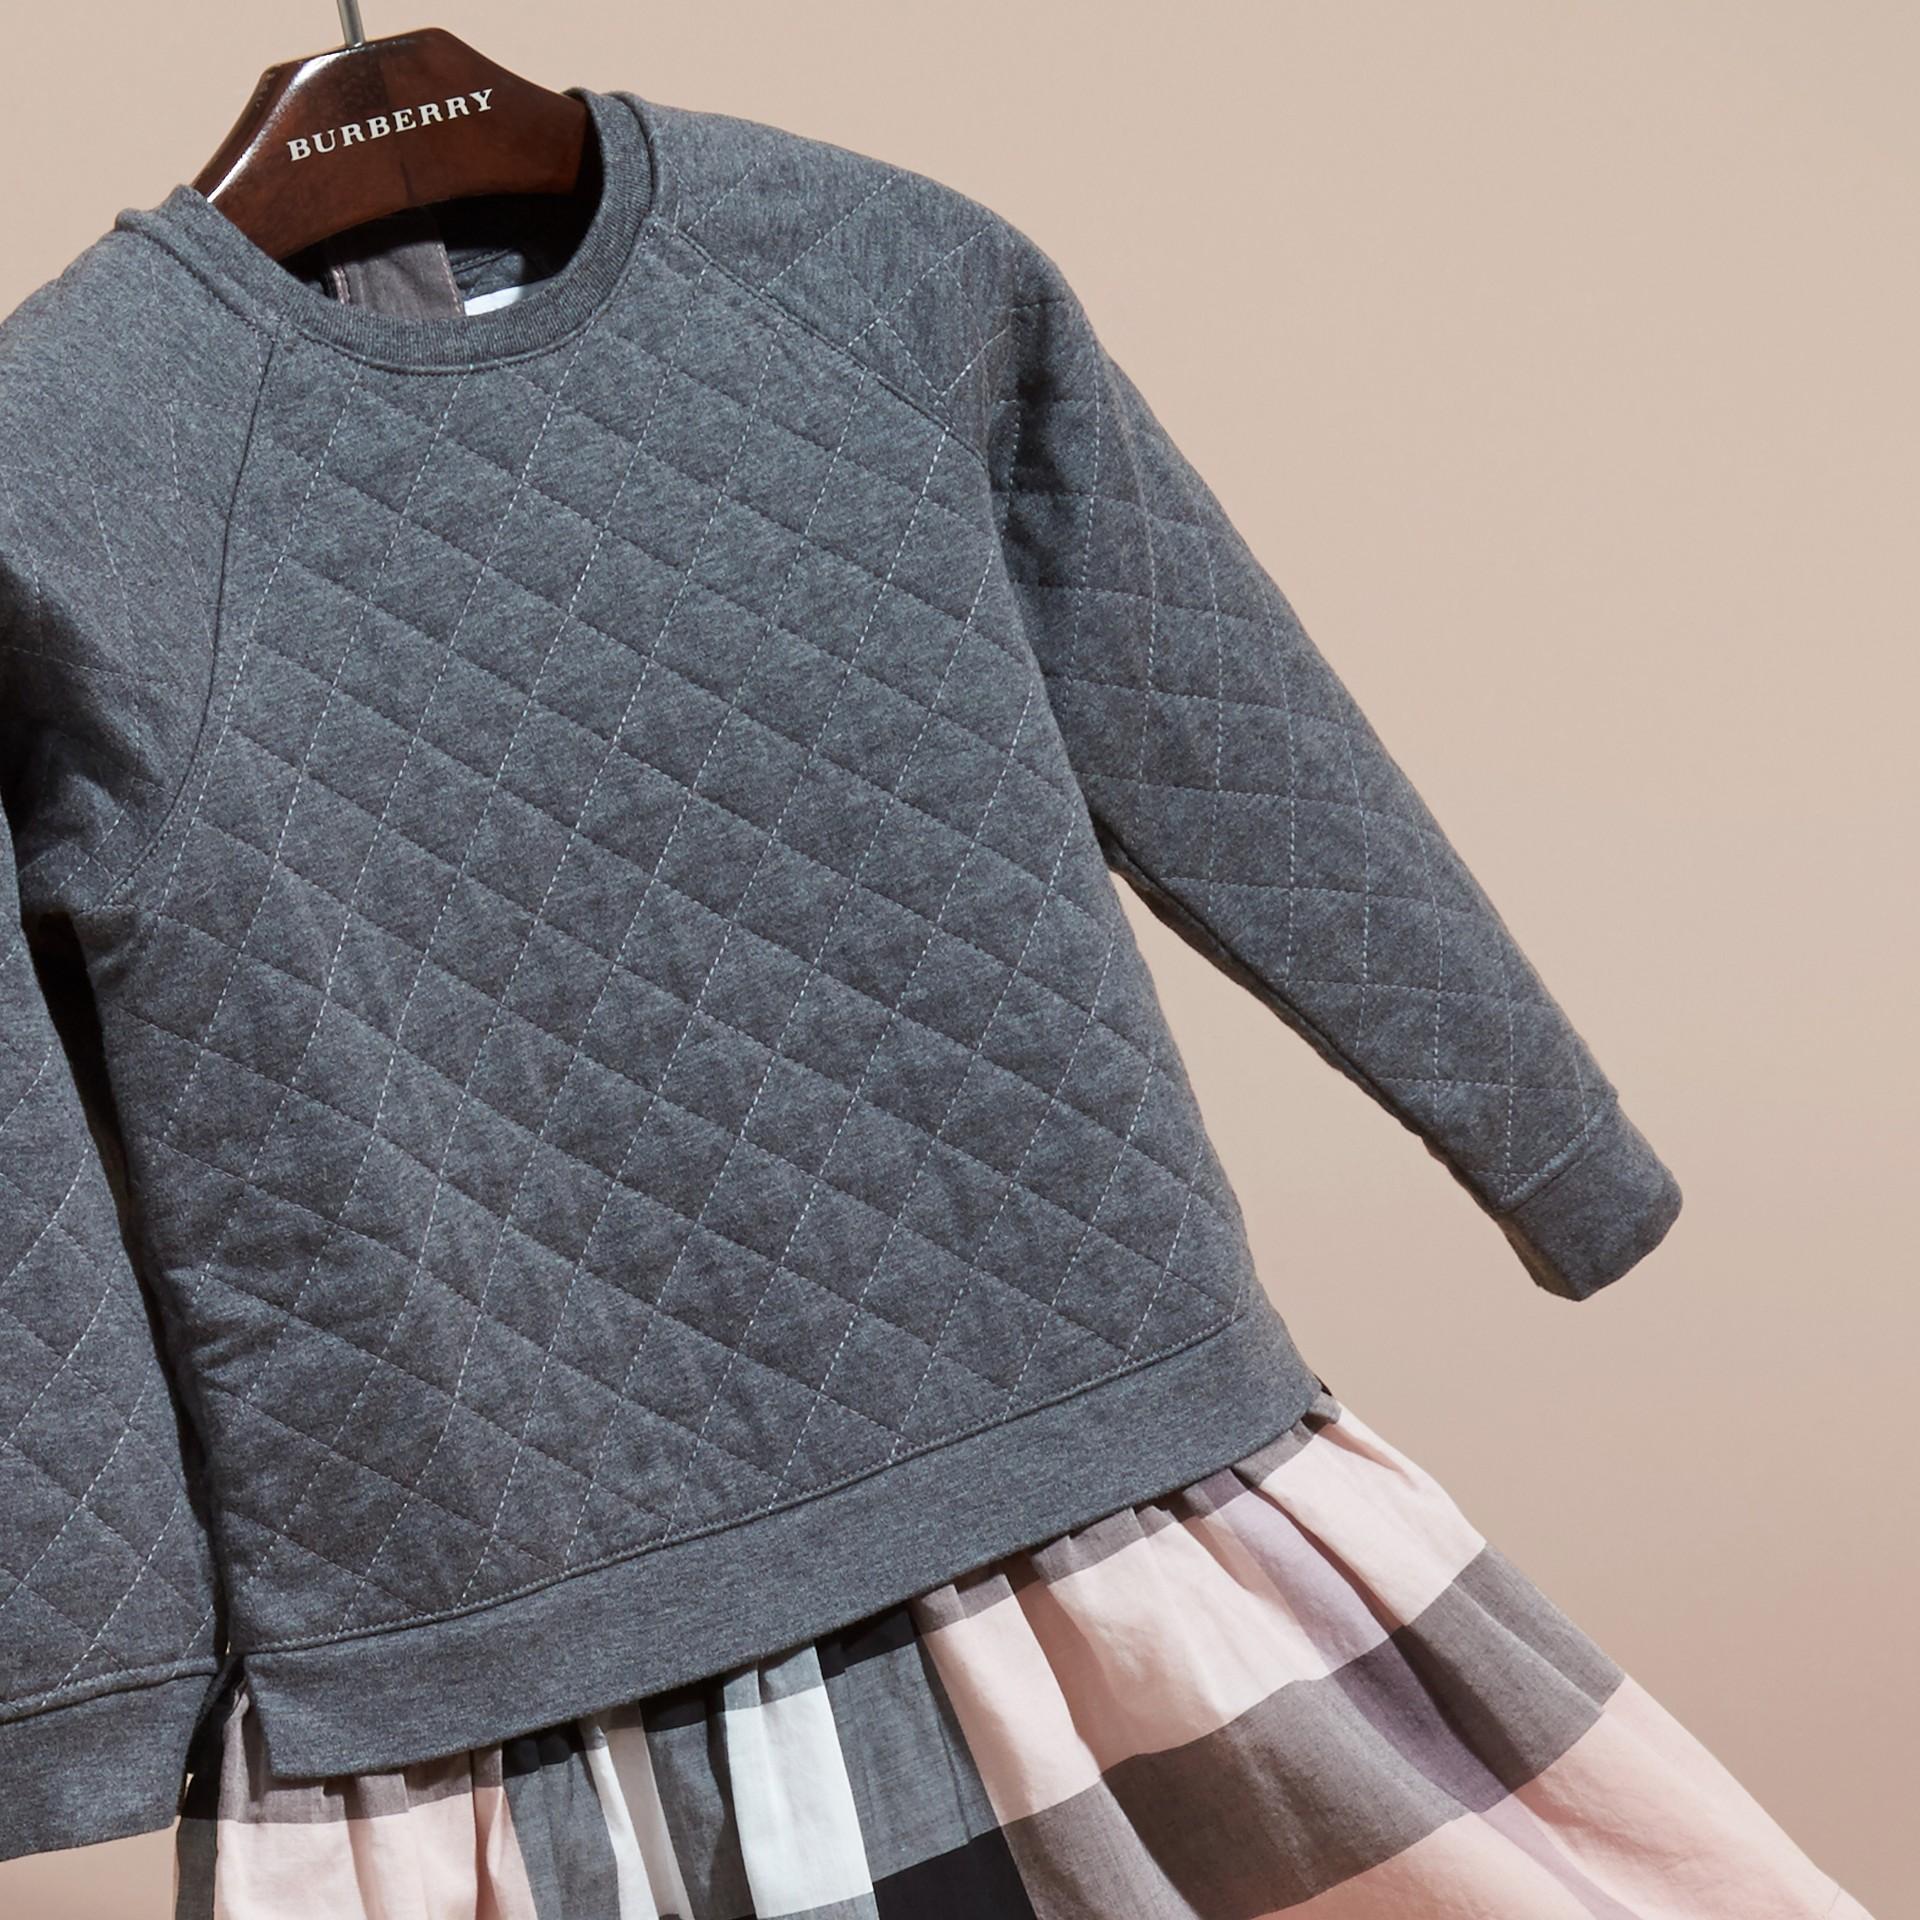 Dark grey melange Quilted Jersey and Check Cotton Day Dress Dark Grey Melange - gallery image 3